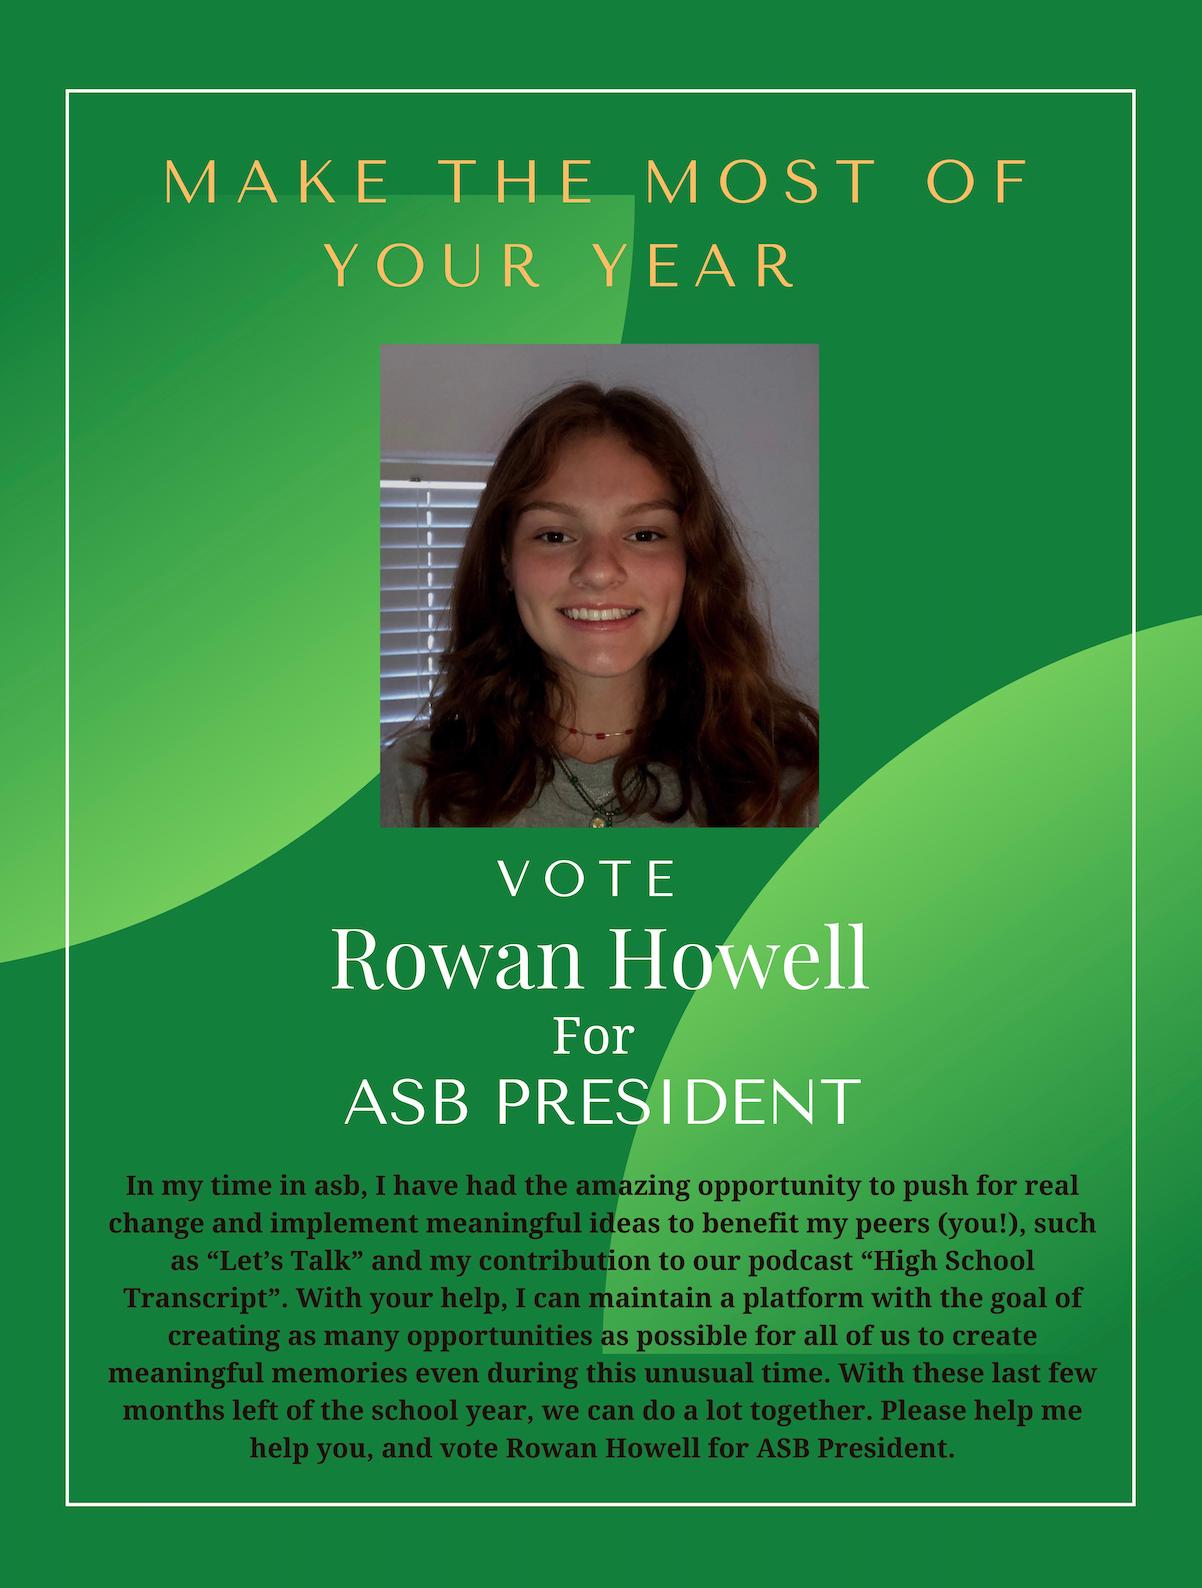 Vote for Rowan